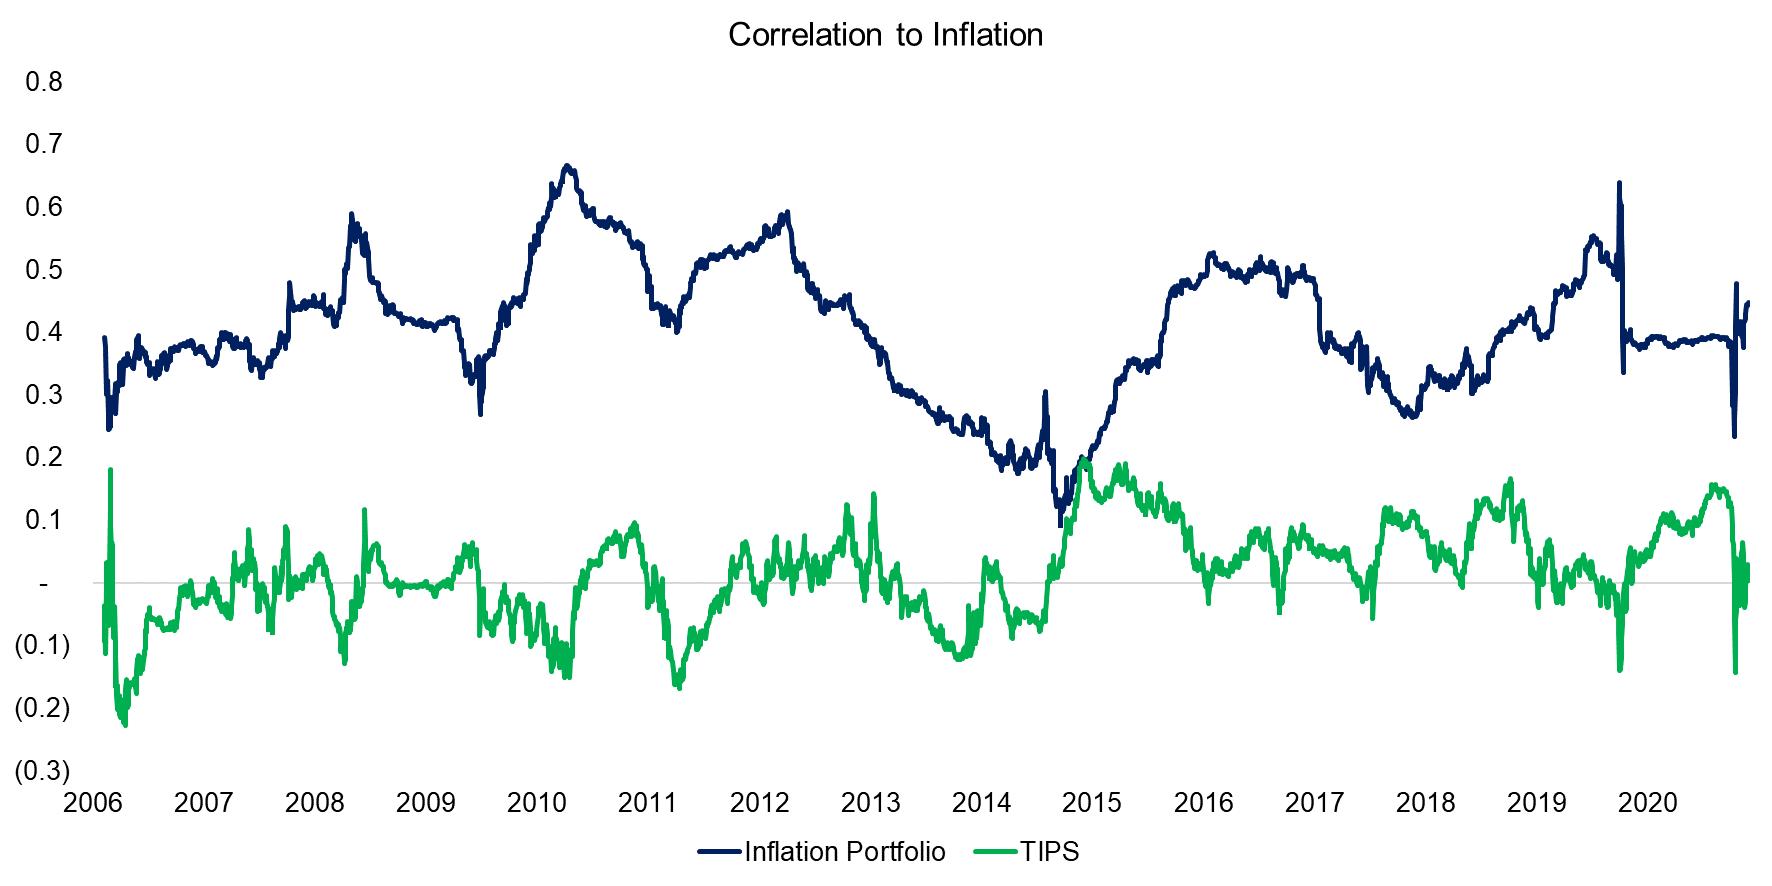 Correlation to Inflation